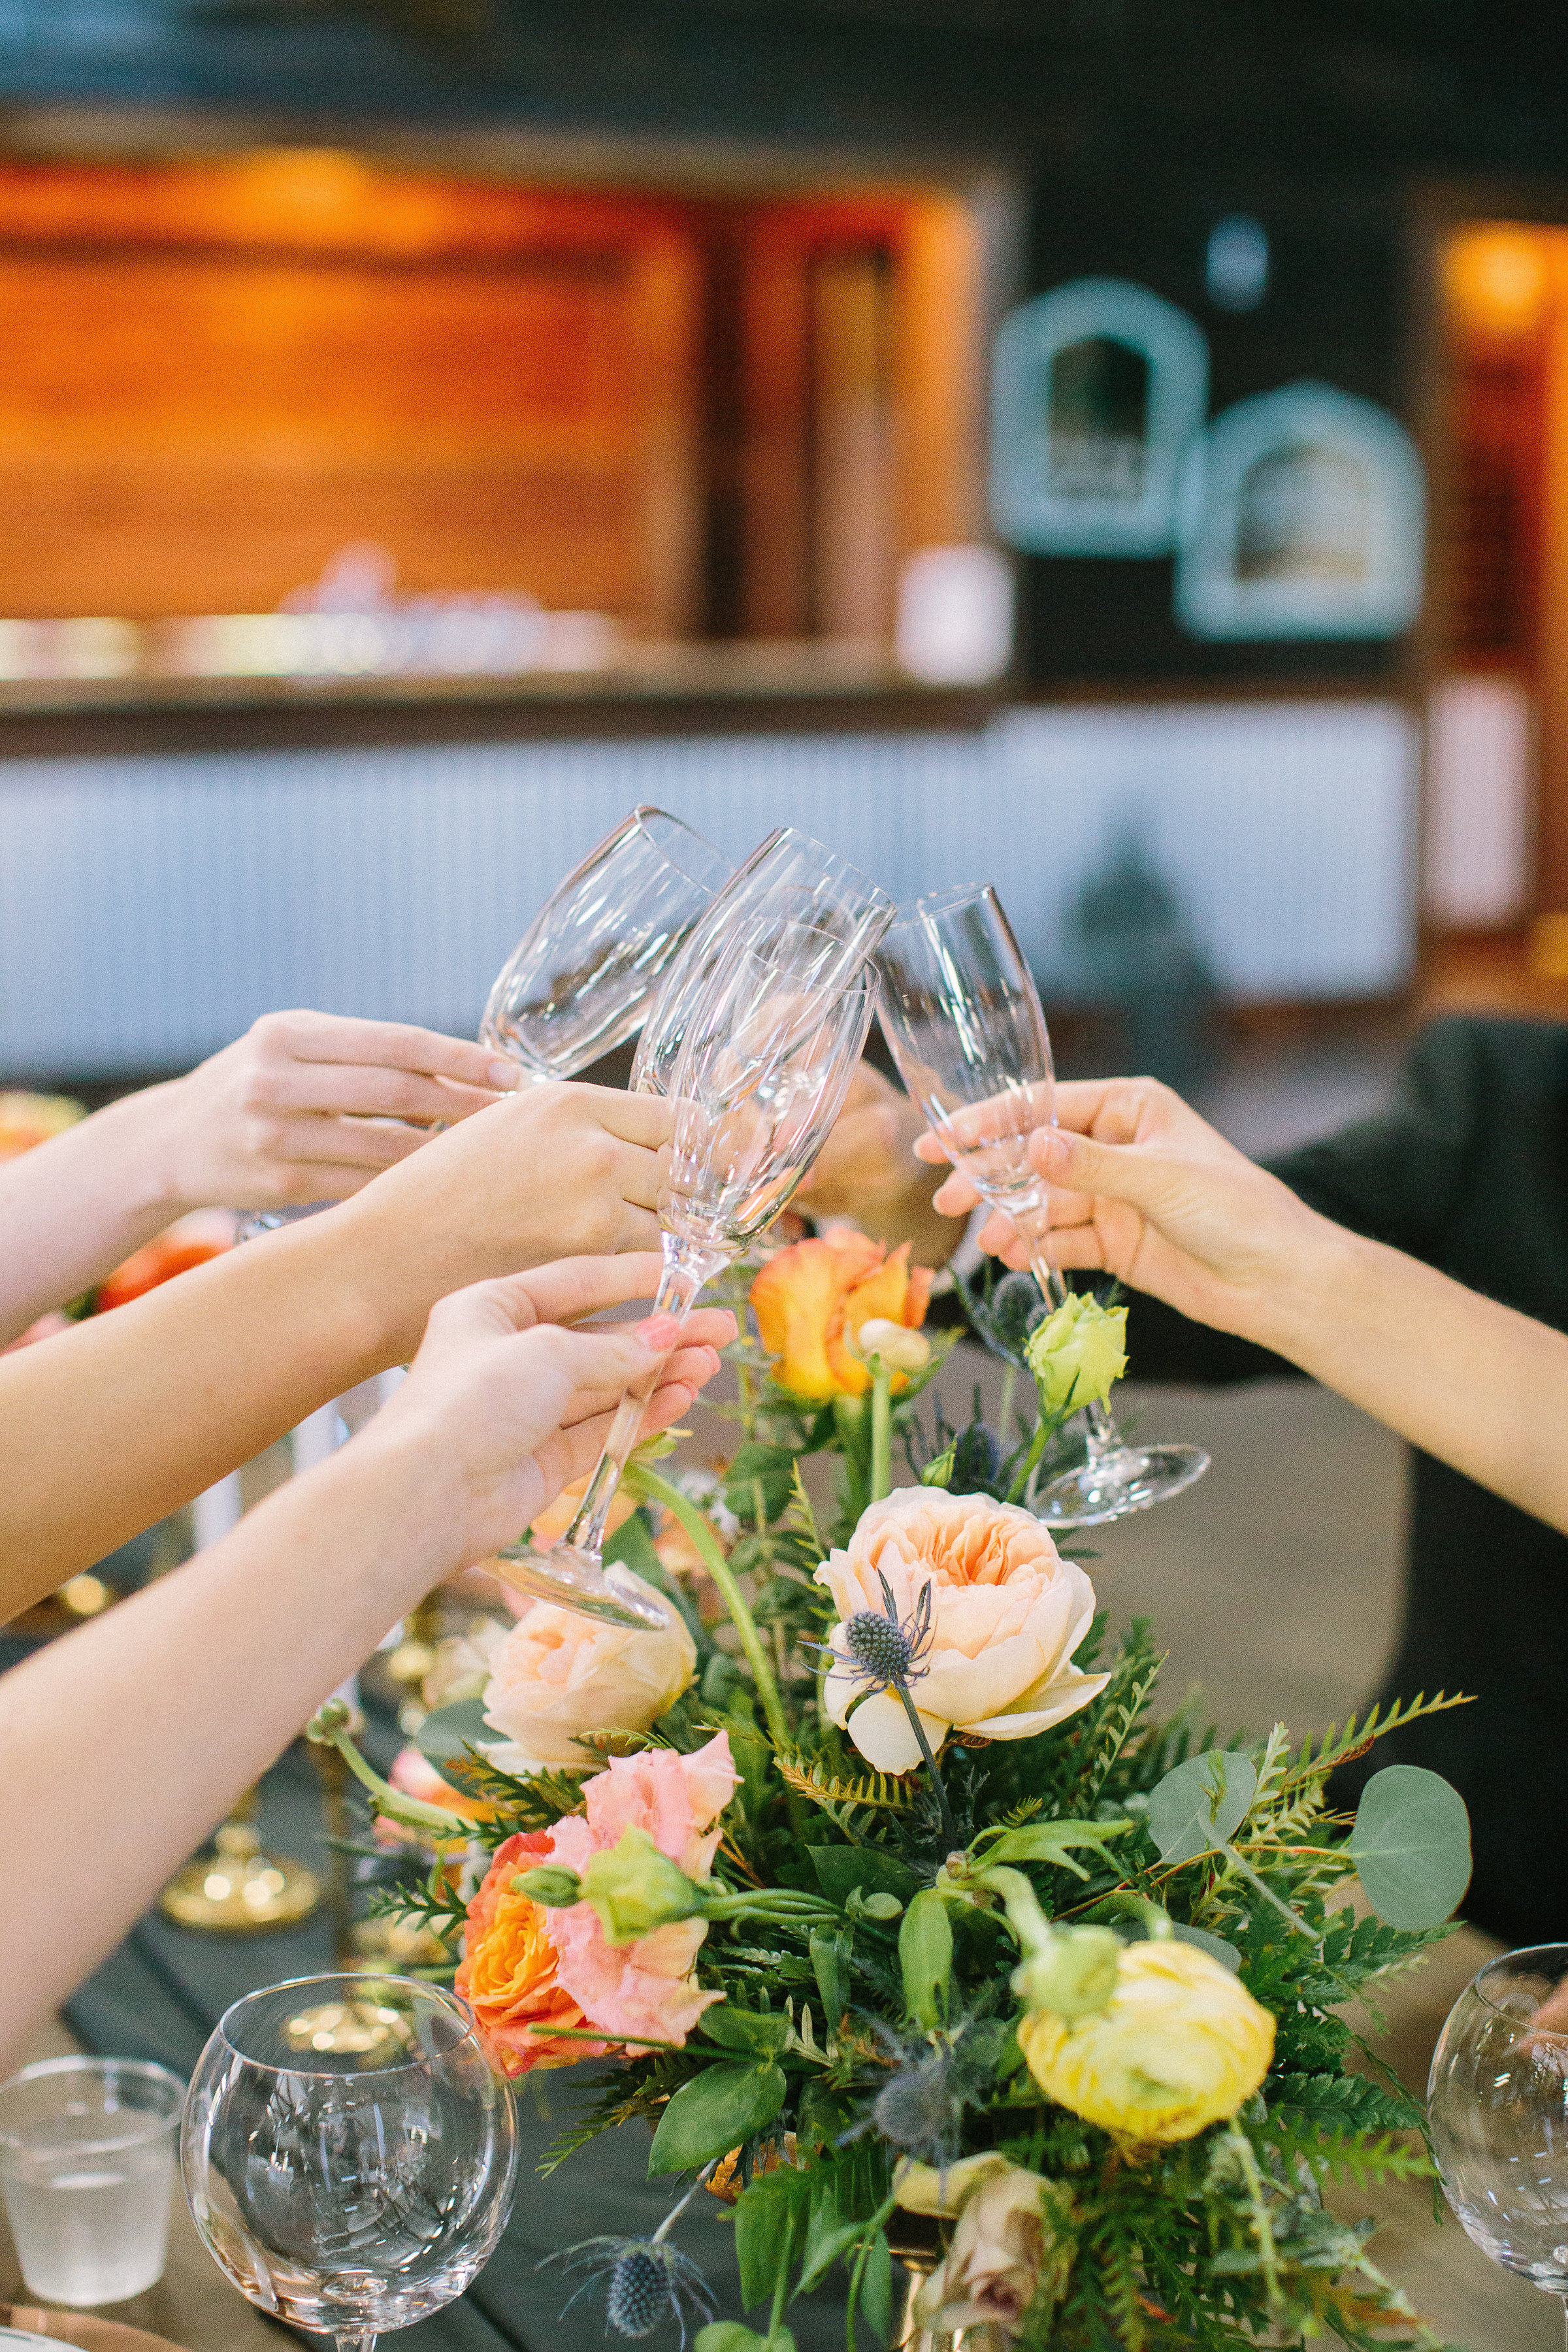 Ellen-Ashton-Photography-Peach-Creek-Ranch-Weddings-Wed-and-Prosper155